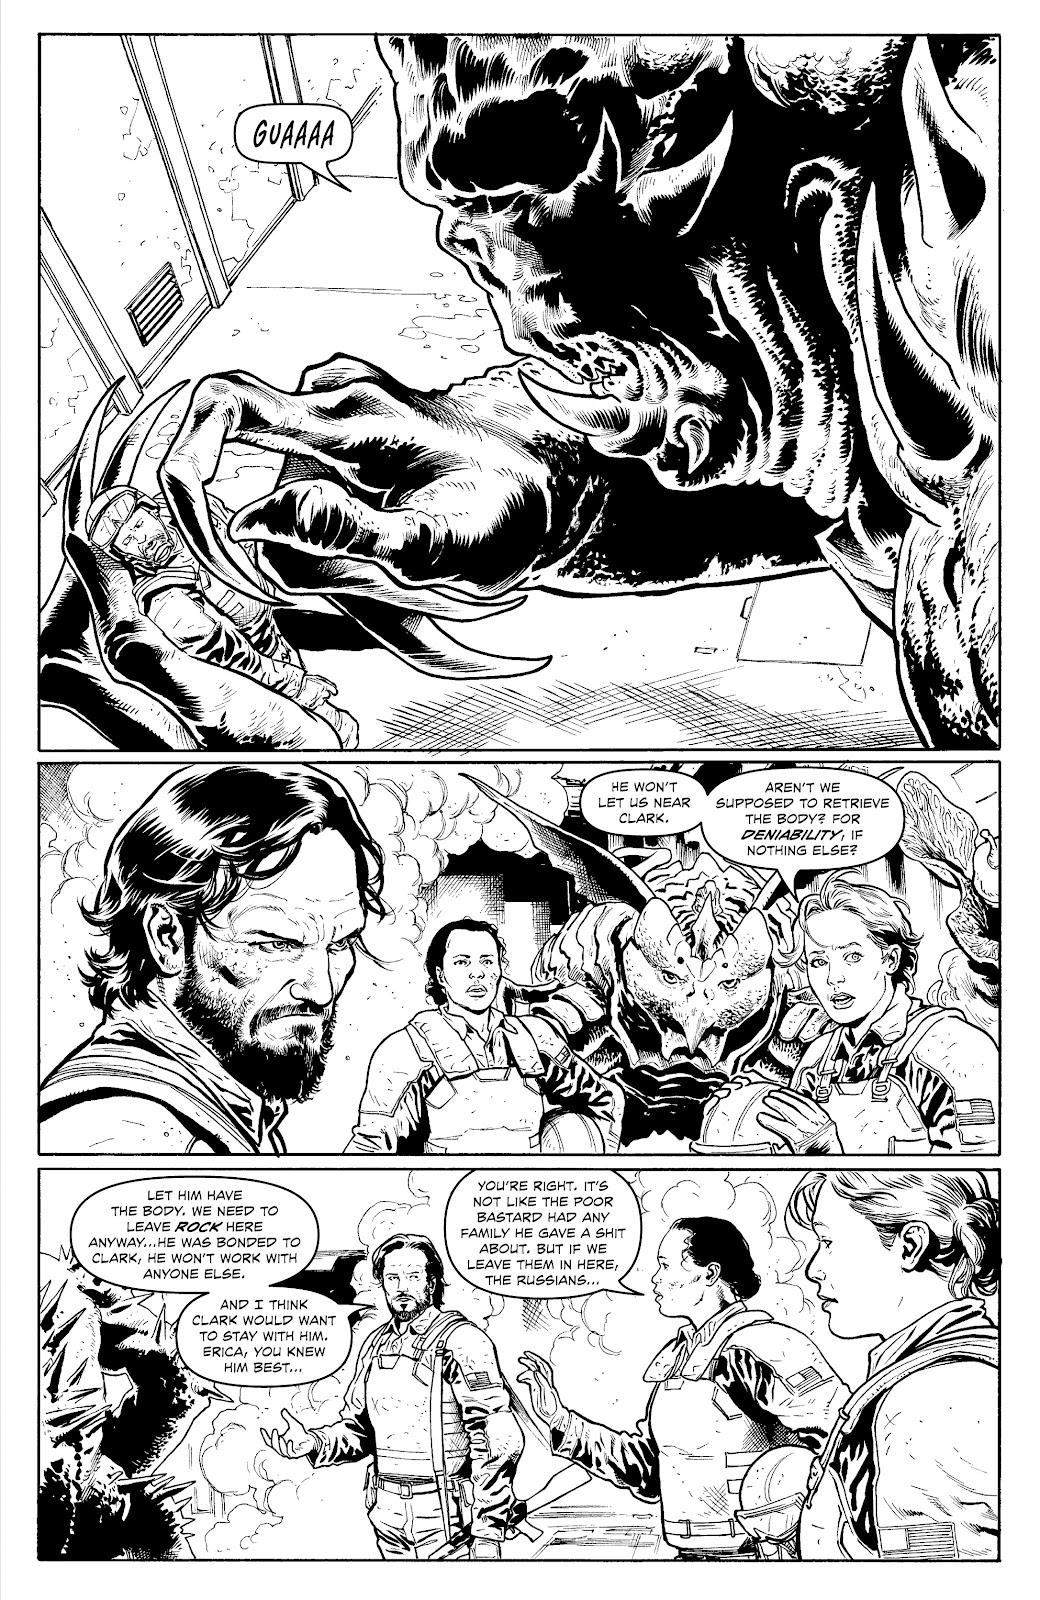 Read online Alan Moore's Cinema Purgatorio comic -  Issue #17 - 45